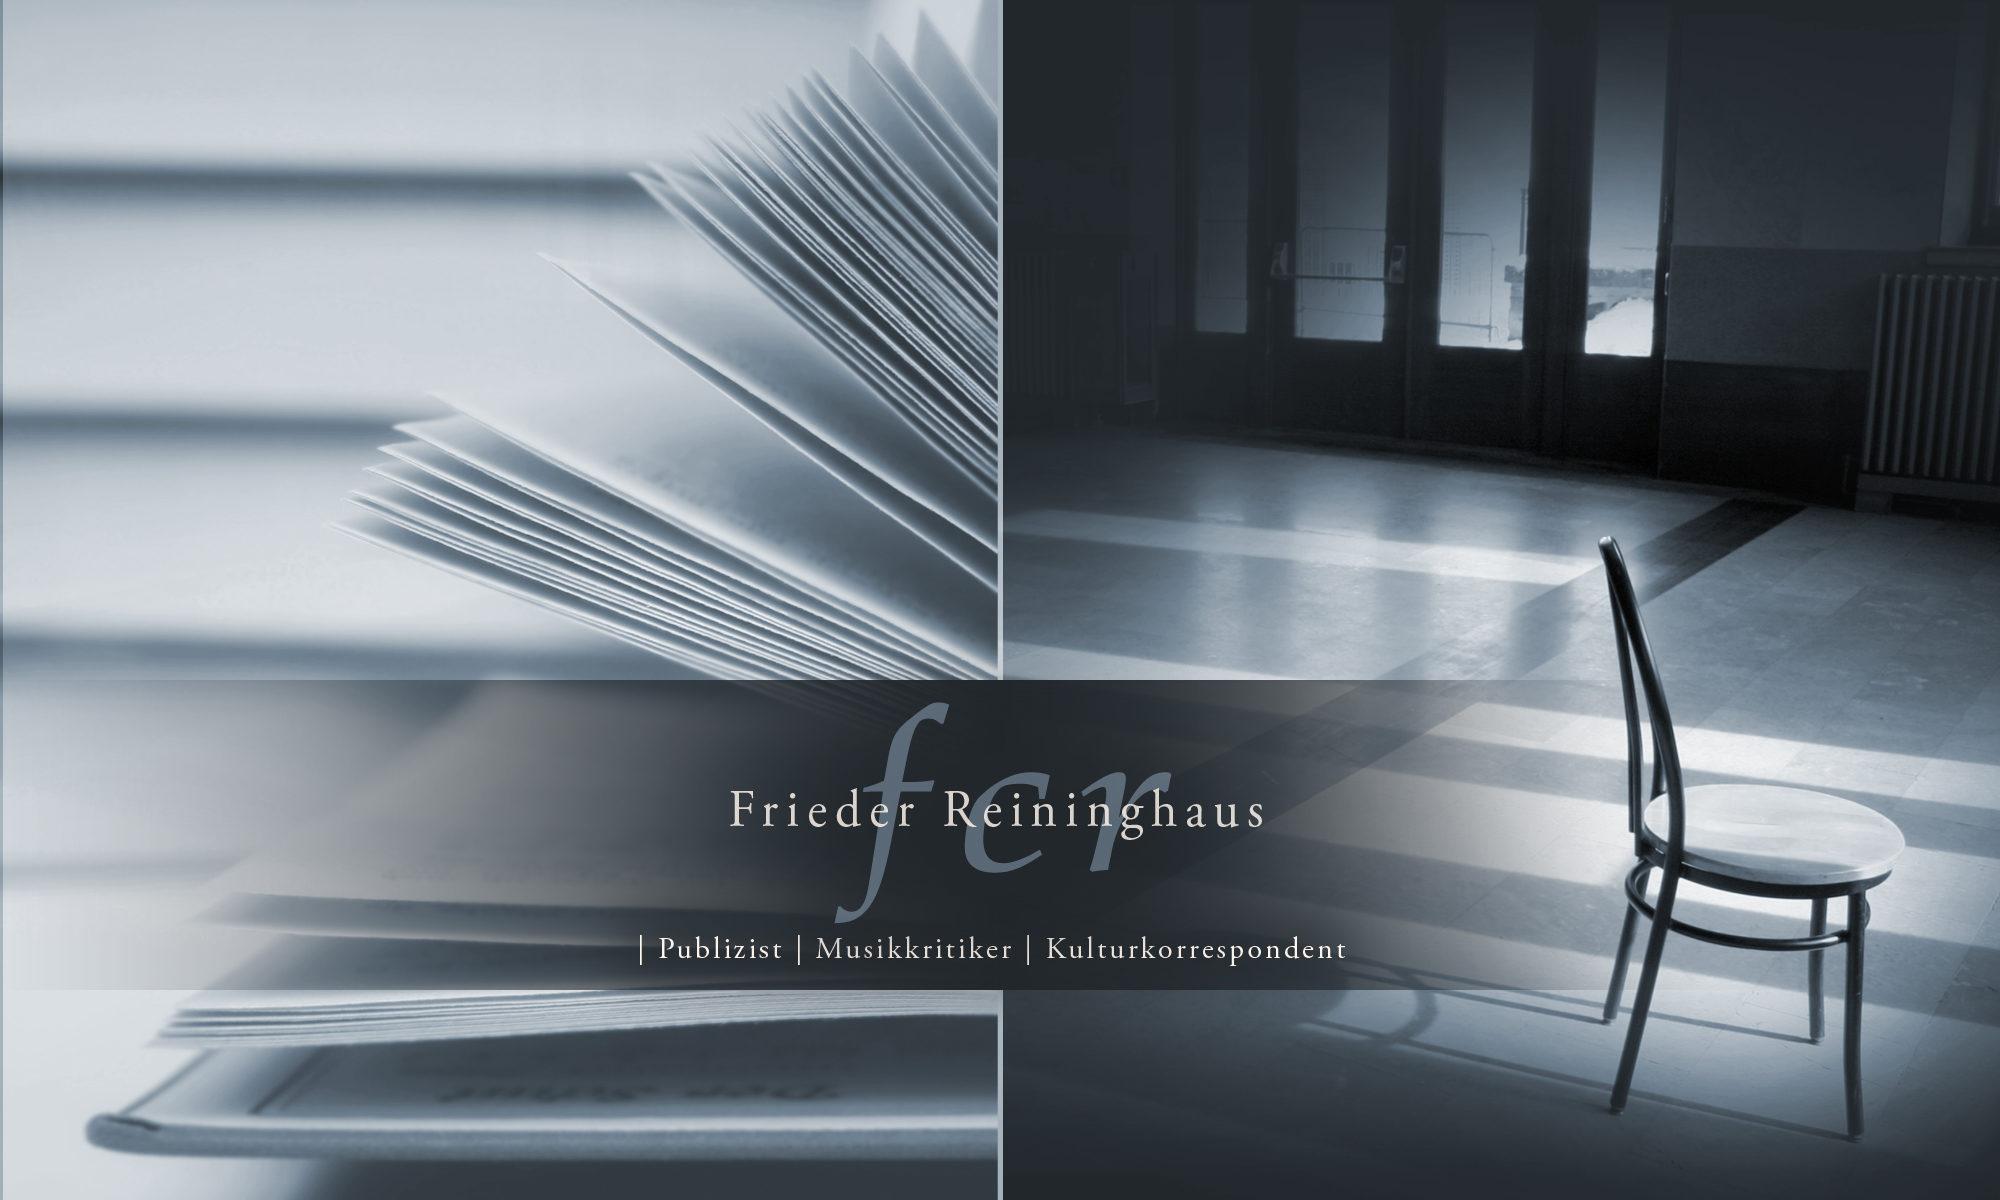 Frieder Reininghaus